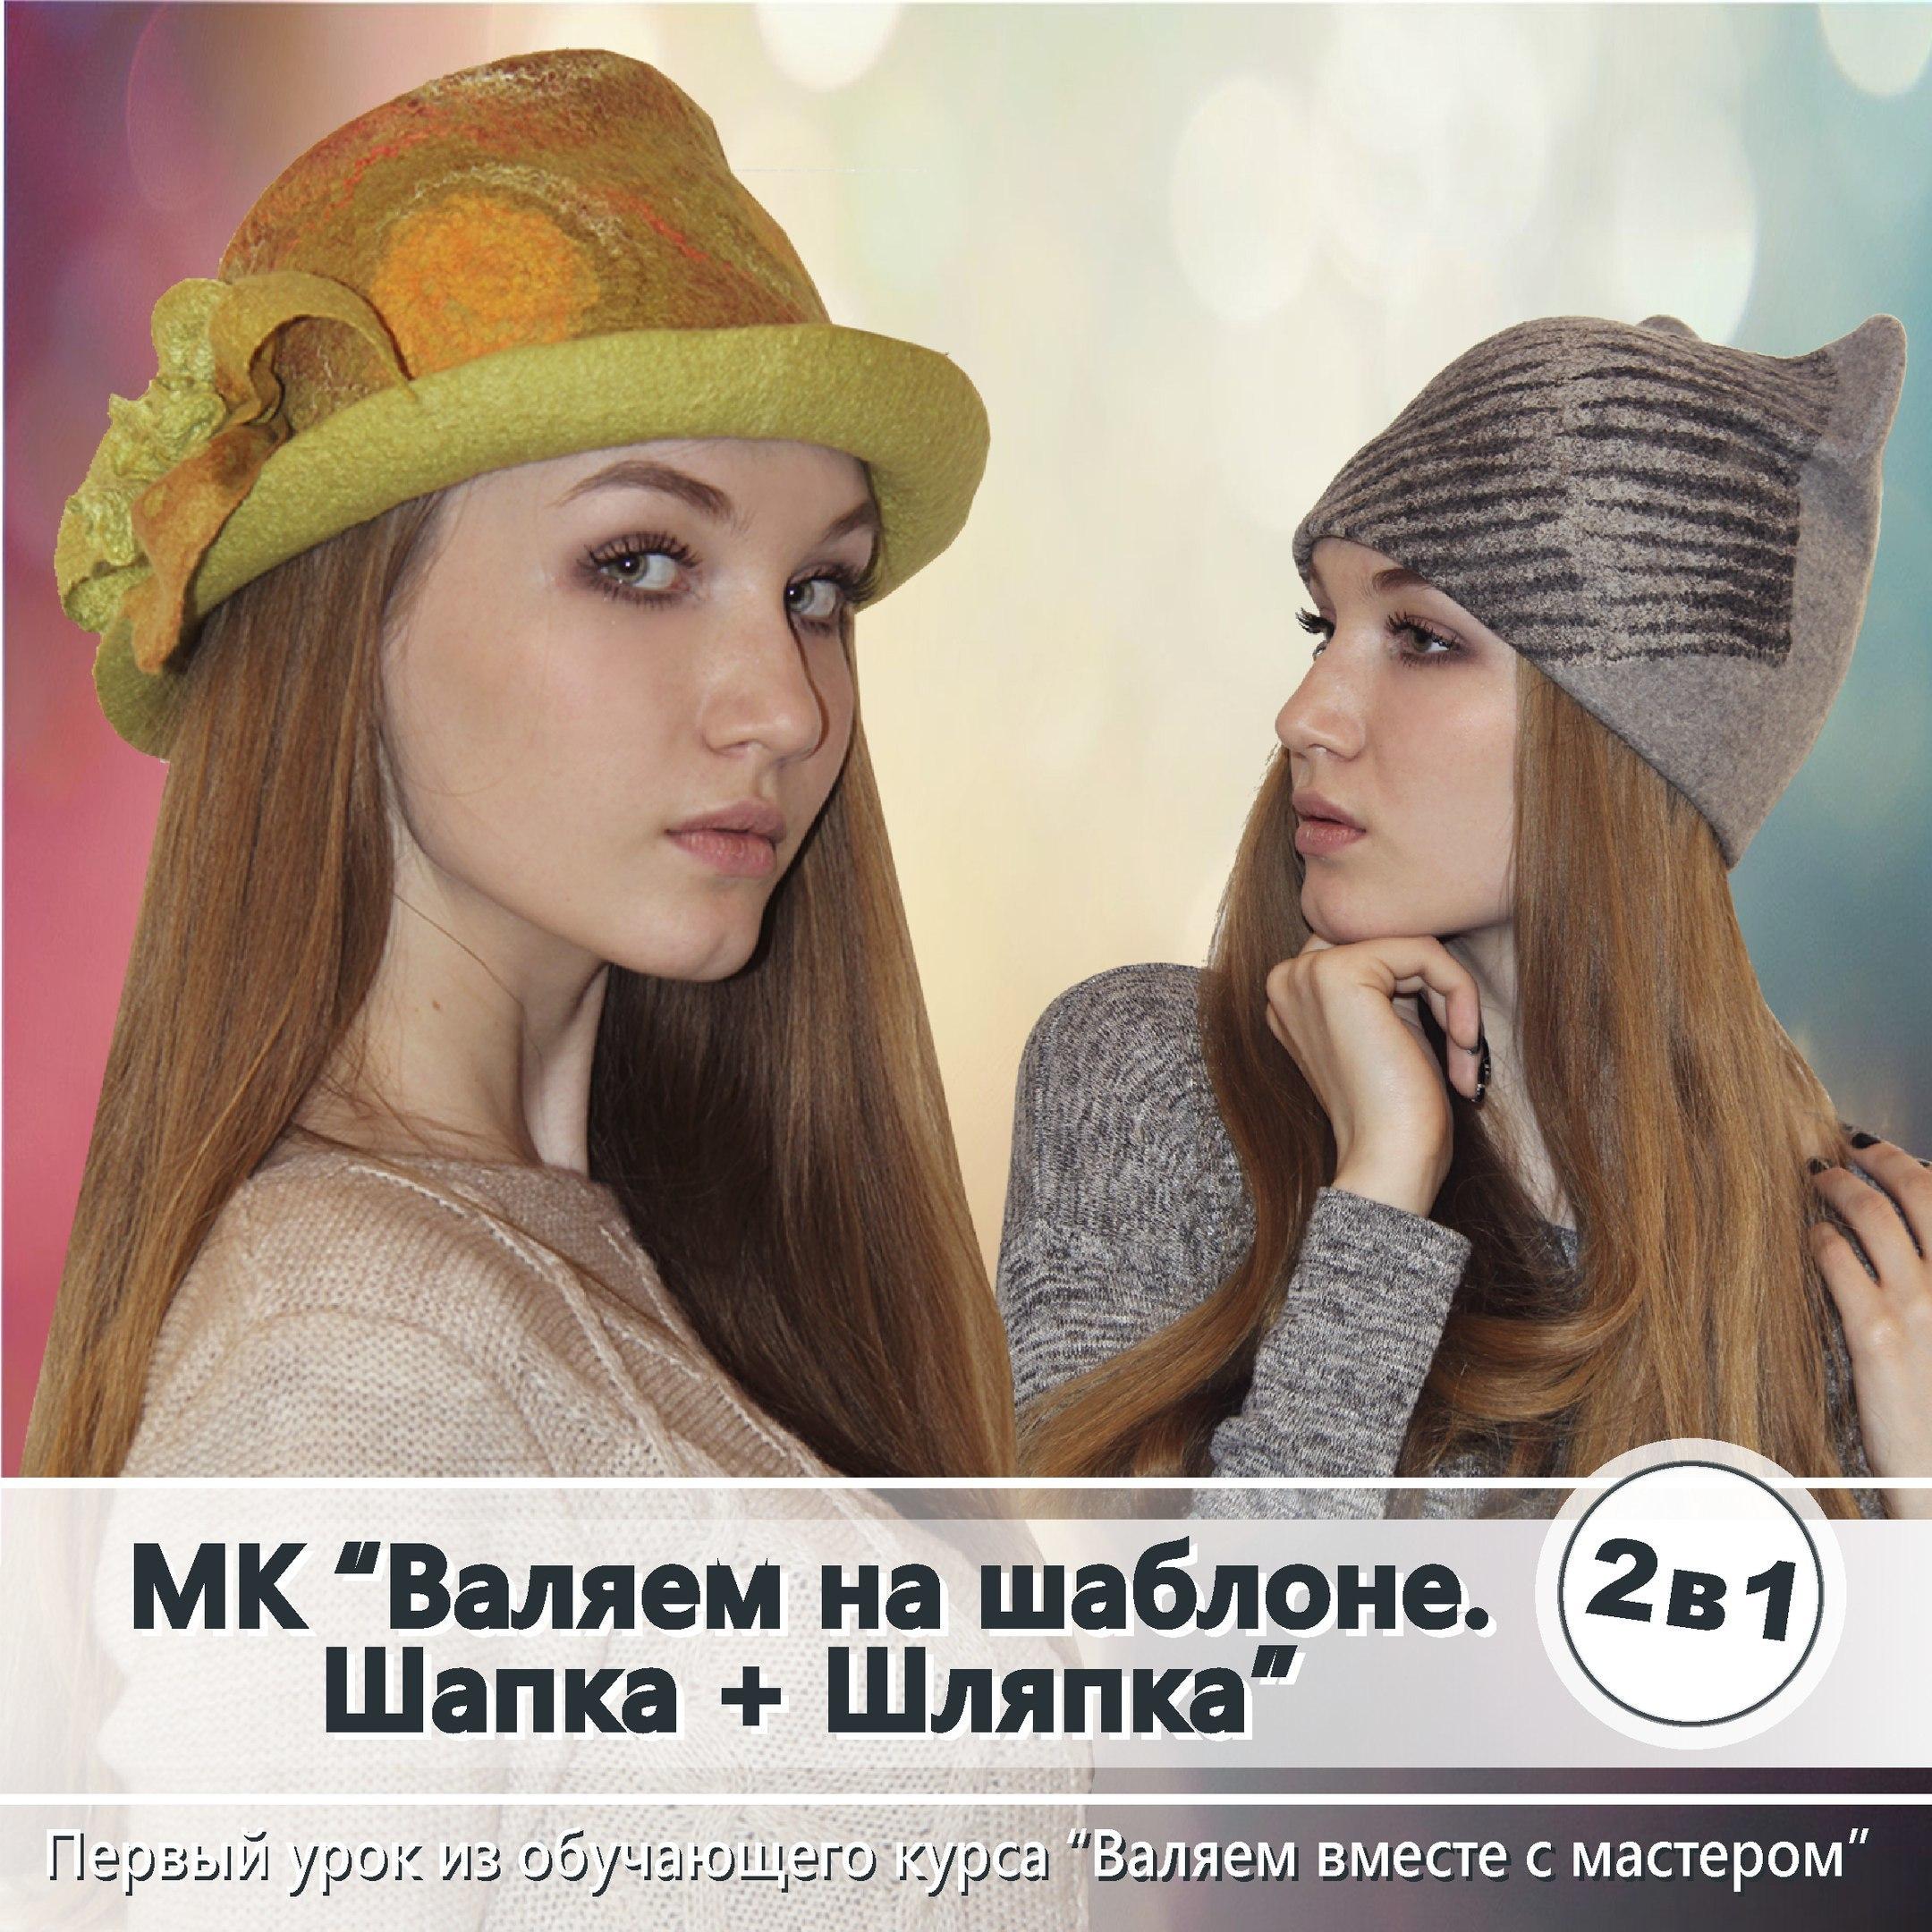 "Видео-МК ""Валяем на шаблоне. Шапка+шляпка"" 00002"